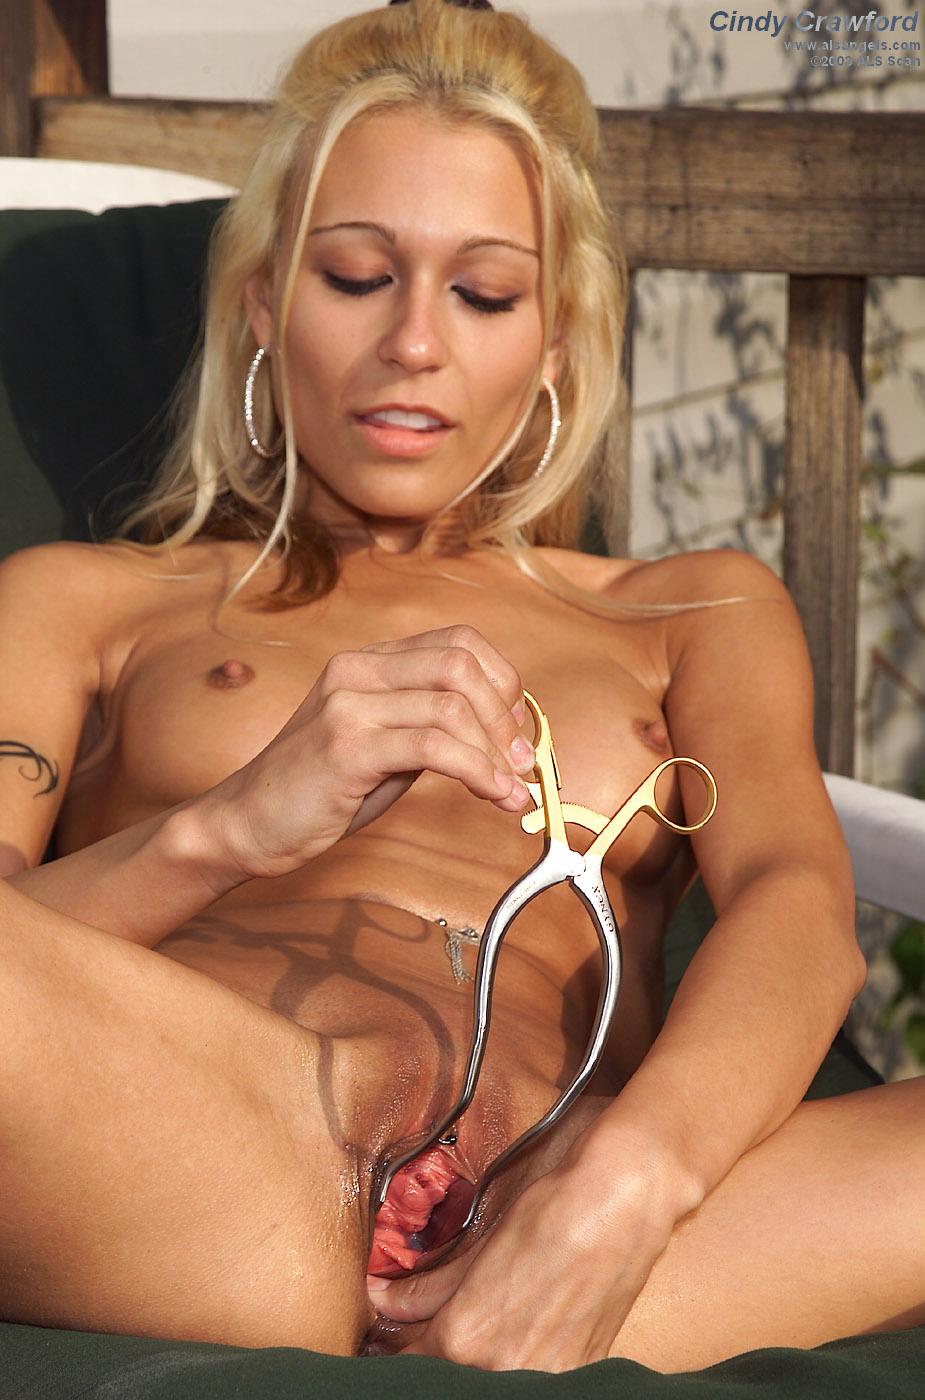 image Cindy crawford alluring blonde get rammed har